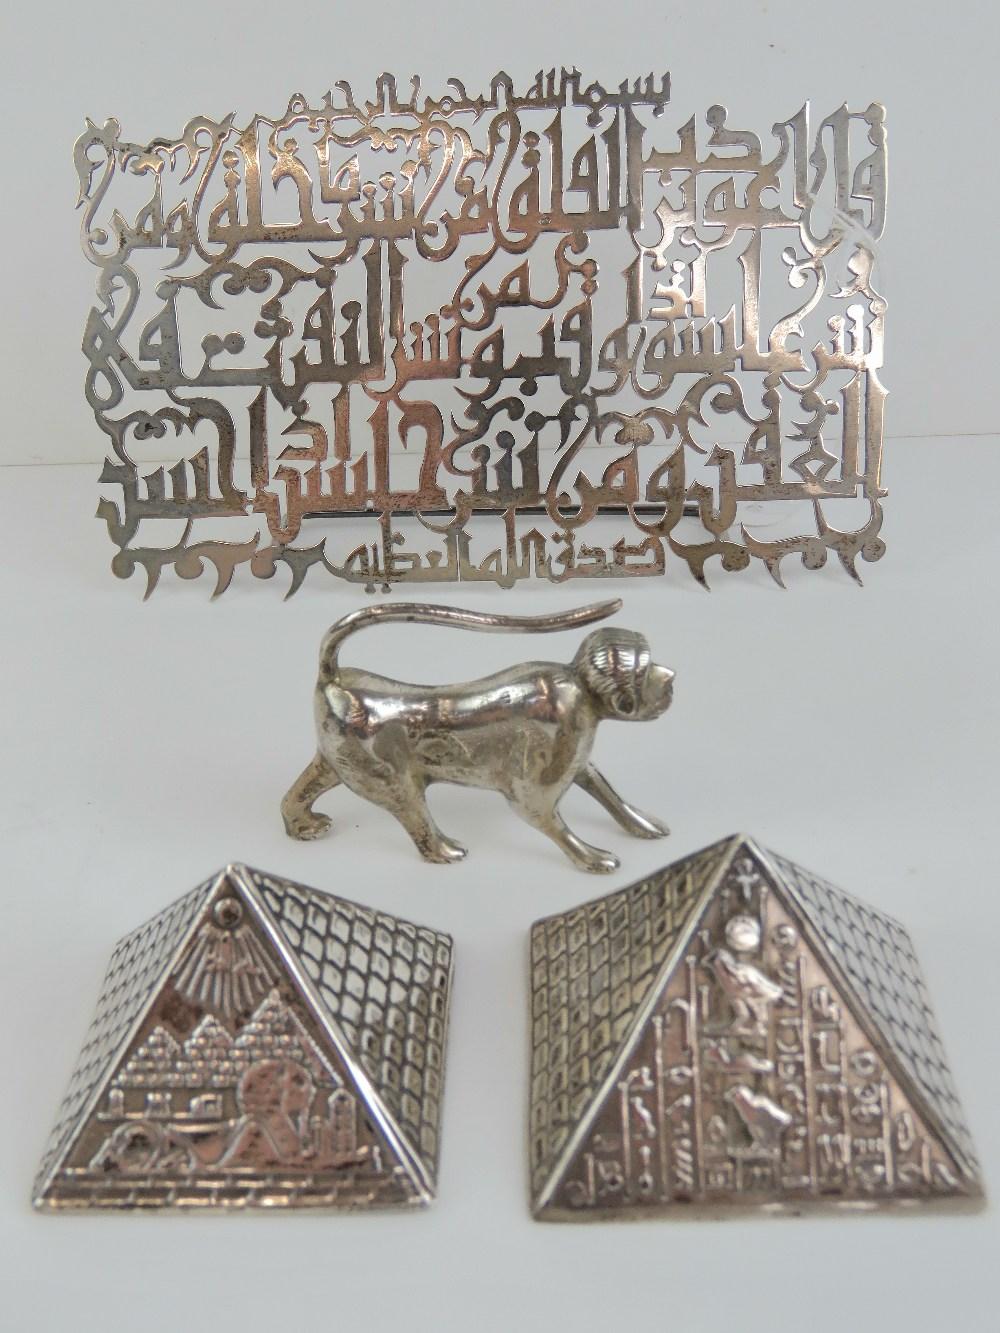 Lot 18 - A decorative pierced white metal excerpt of Arabic text, having Arabic hallmark upon.